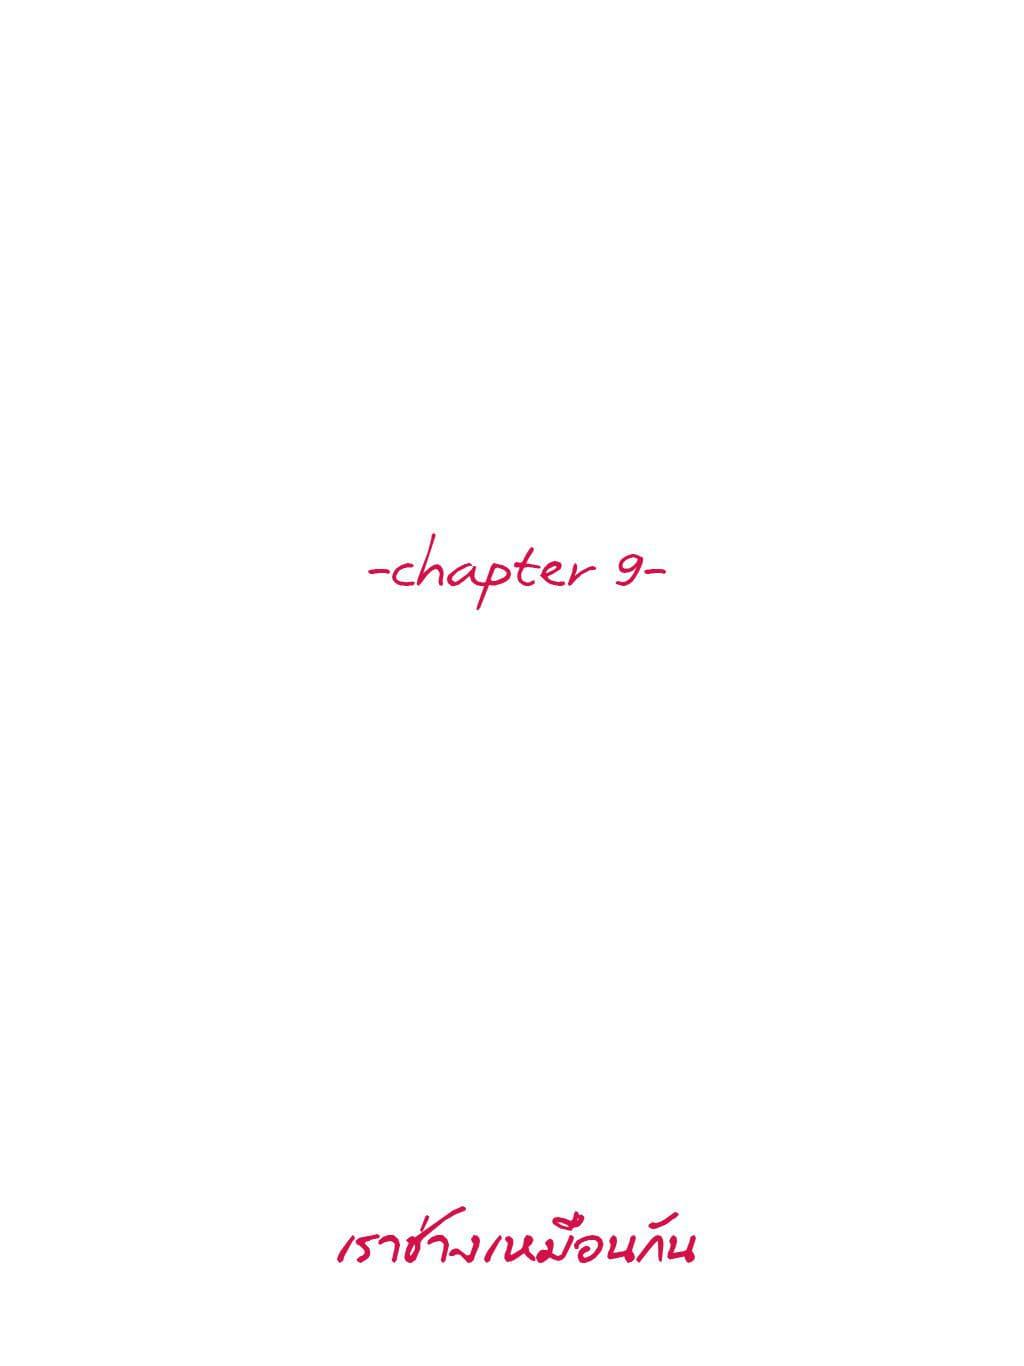 chapter 9 - เราช่างเหมือนกัน